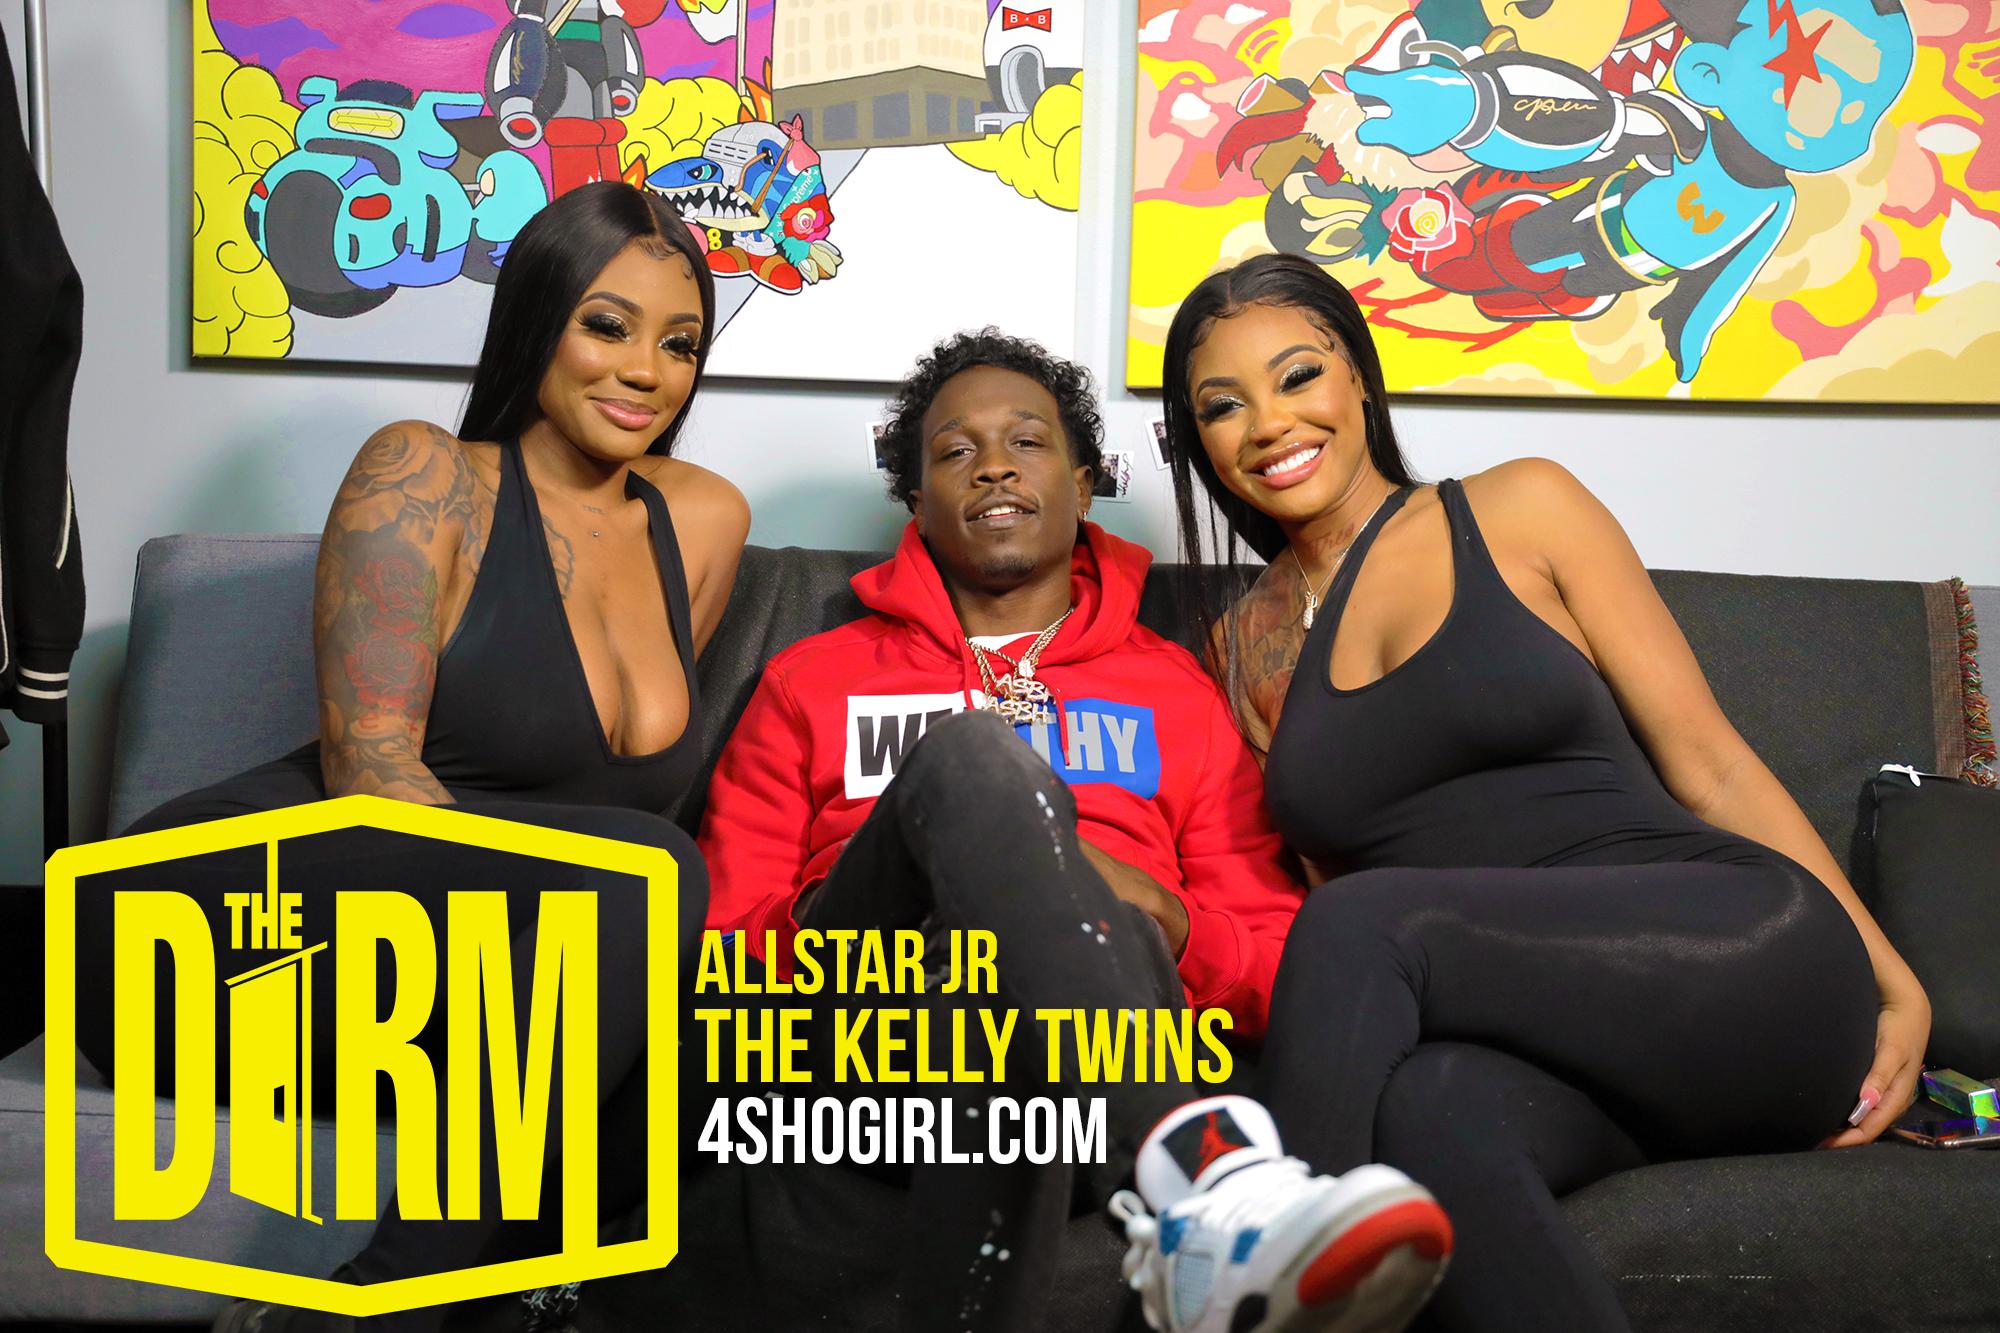 The Kelly Twins x AllStar JR